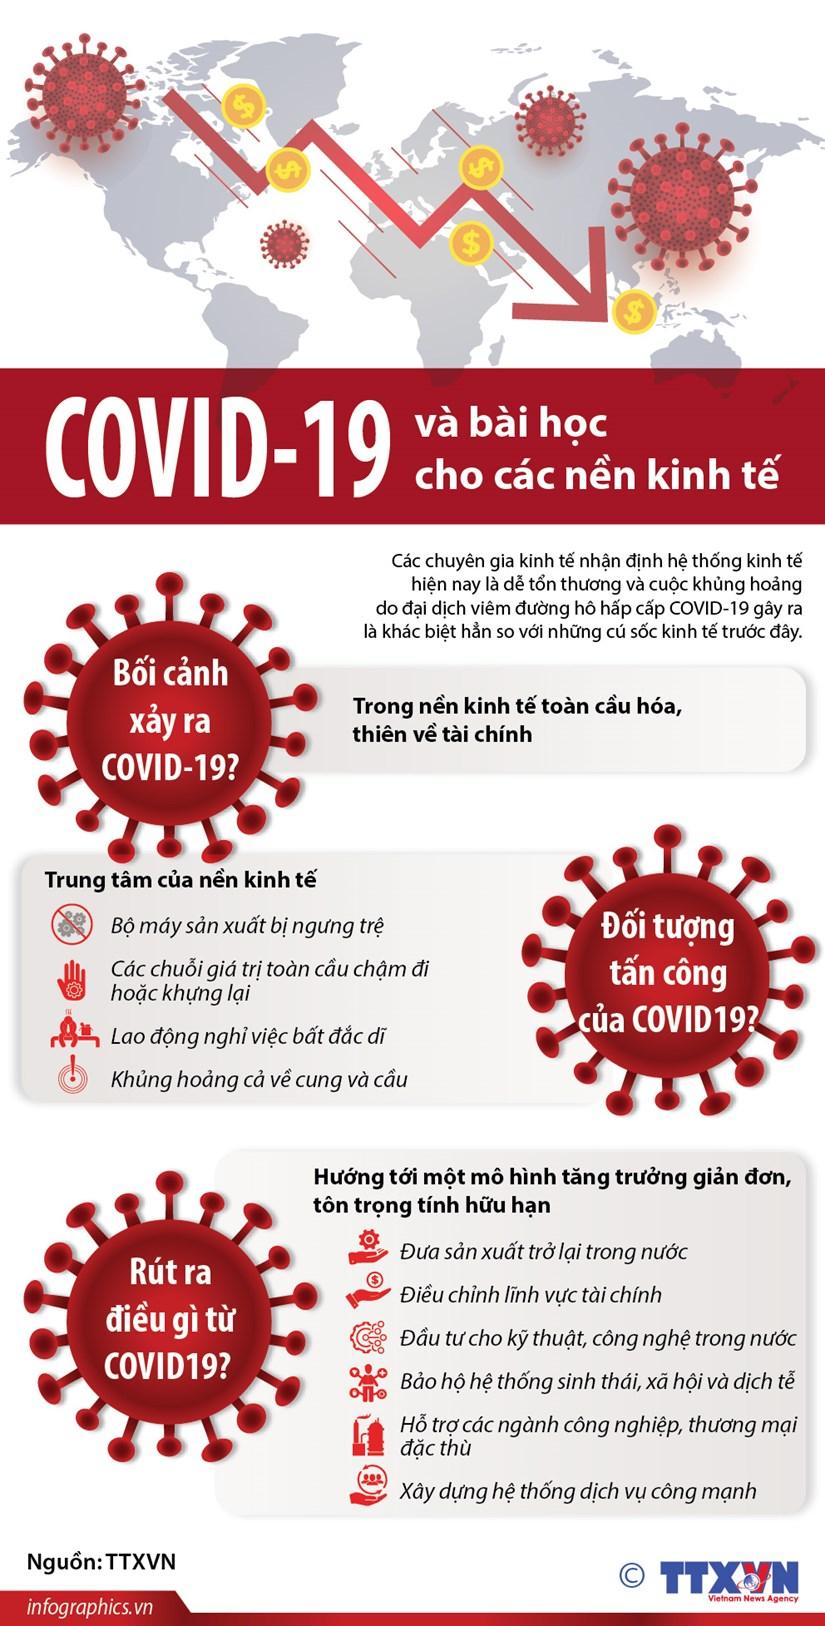 [Infographics] COVID-19 va bai hoc cho cac nen kinh te hinh anh 1